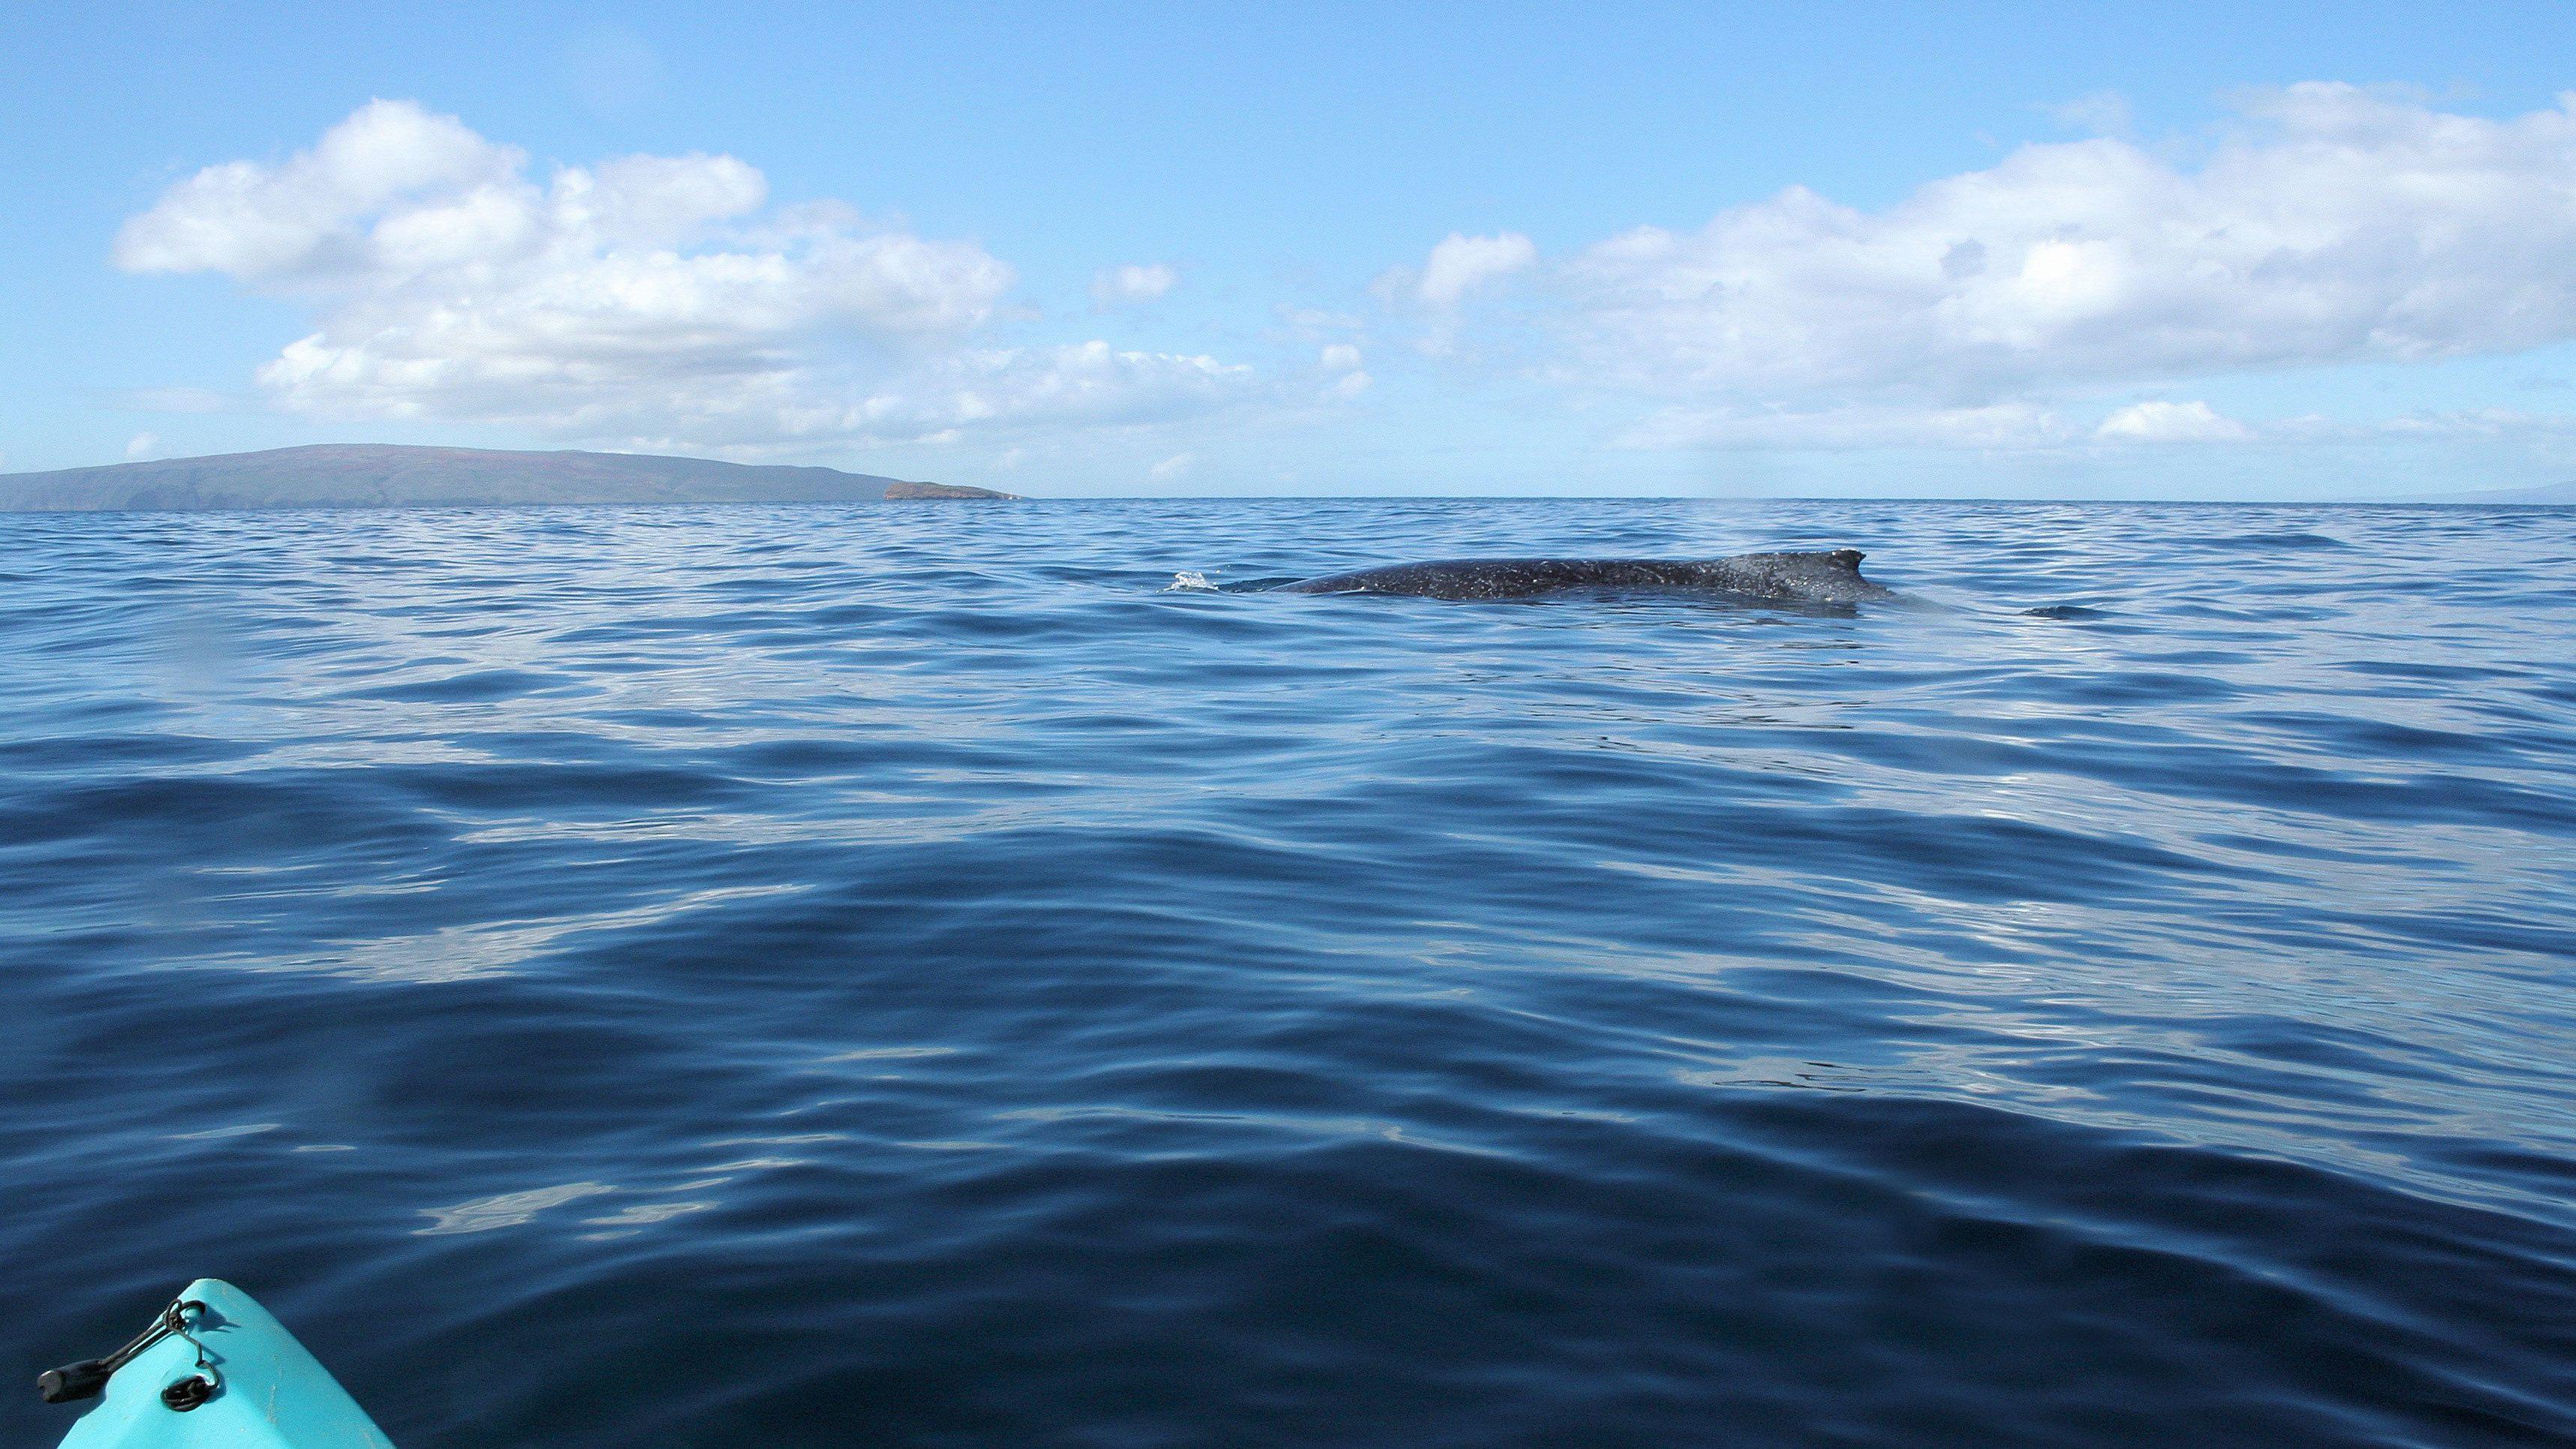 Whale breaching surface near kayak in Maui